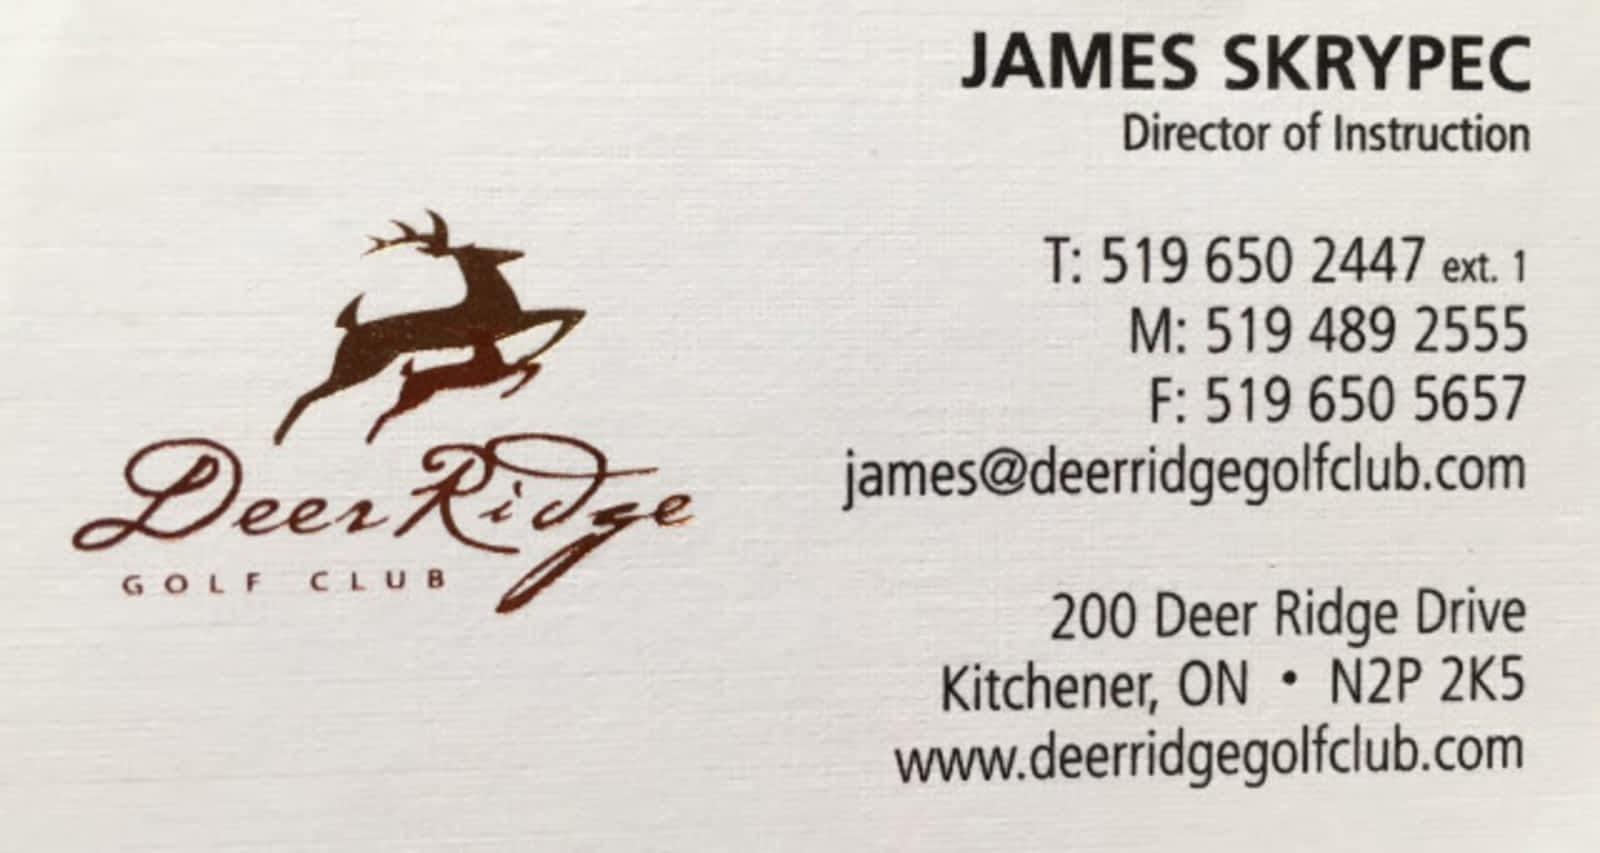 James Skrypec Golf - Opening Hours - 200 Deer Ridge Dr, Kitchener, ON